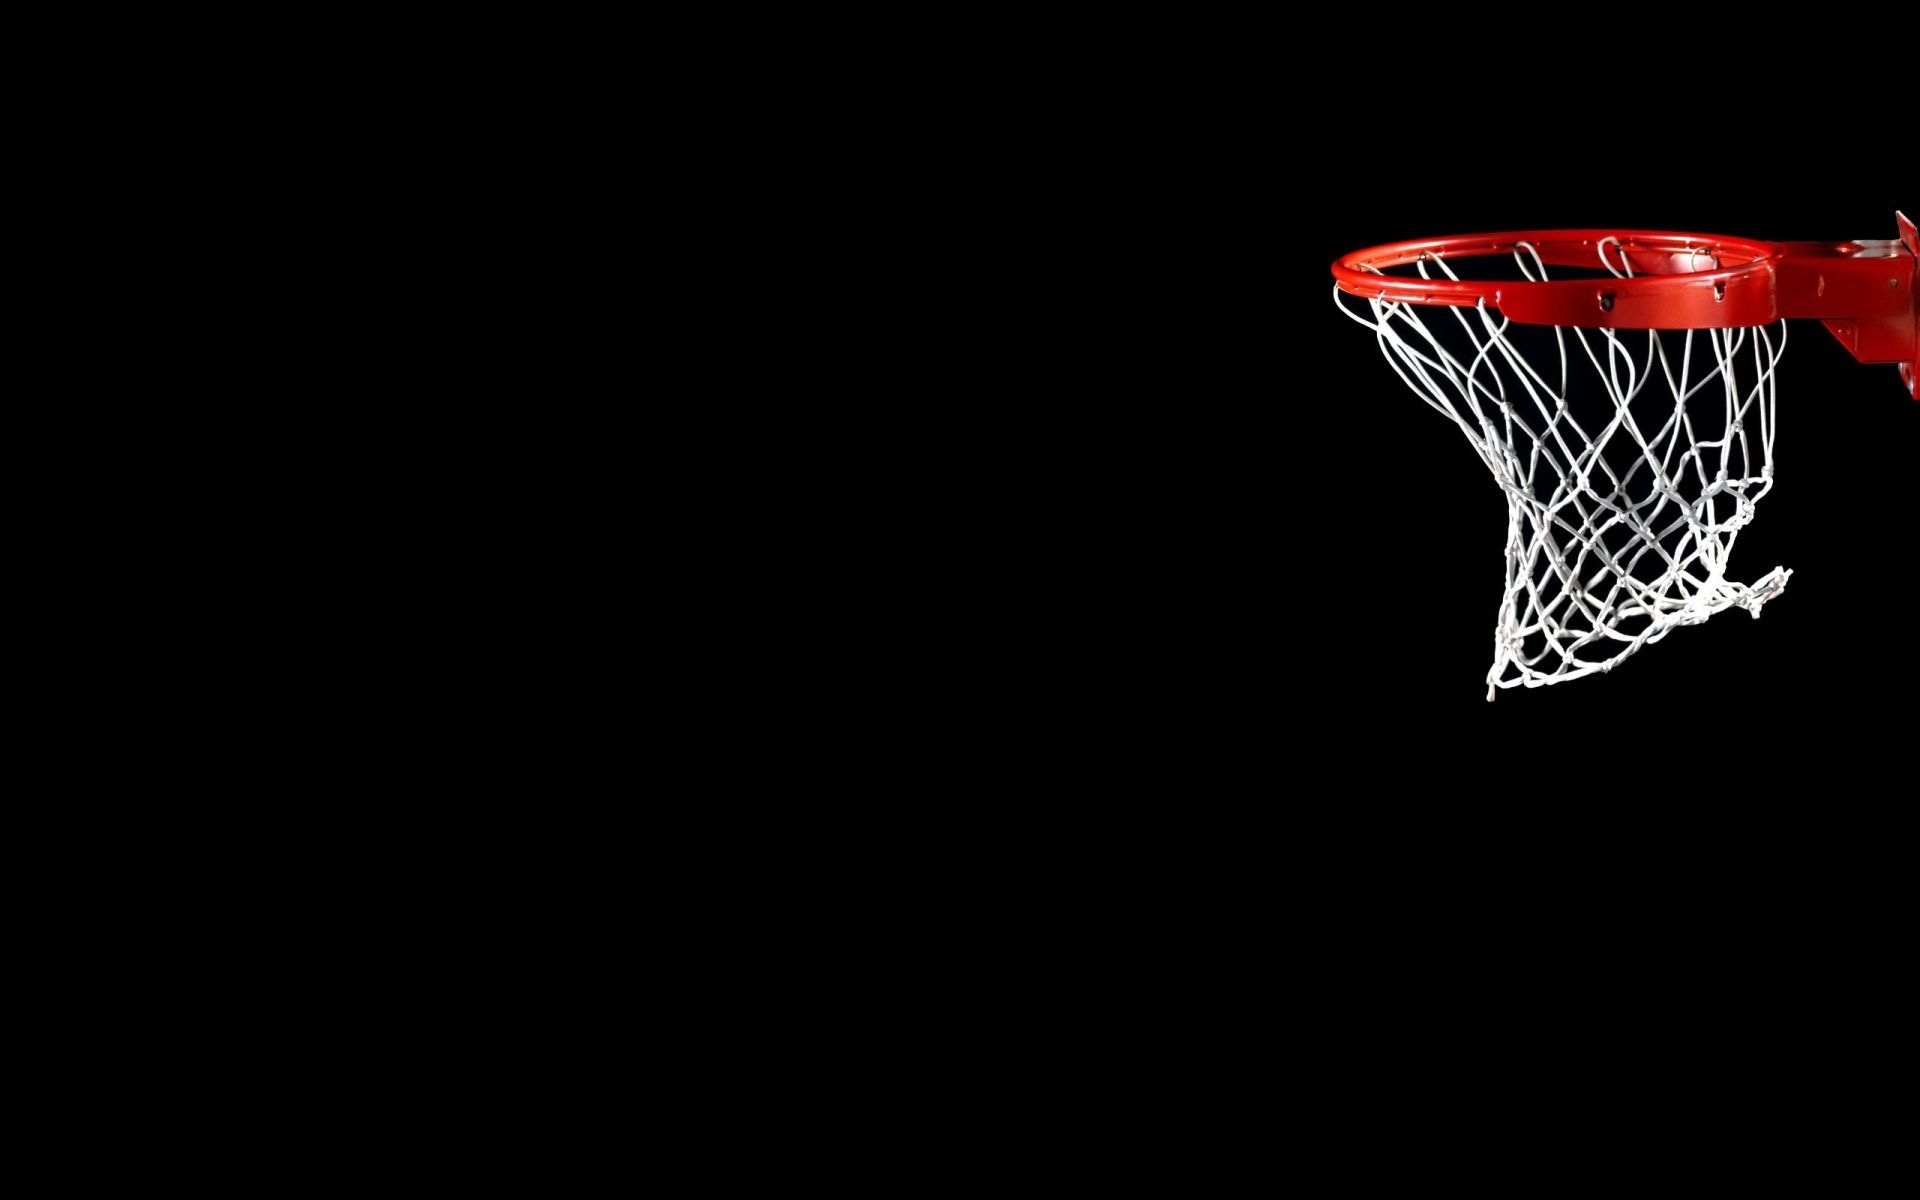 1920x1200 Basketball Hoop Black Hd Wallpaper